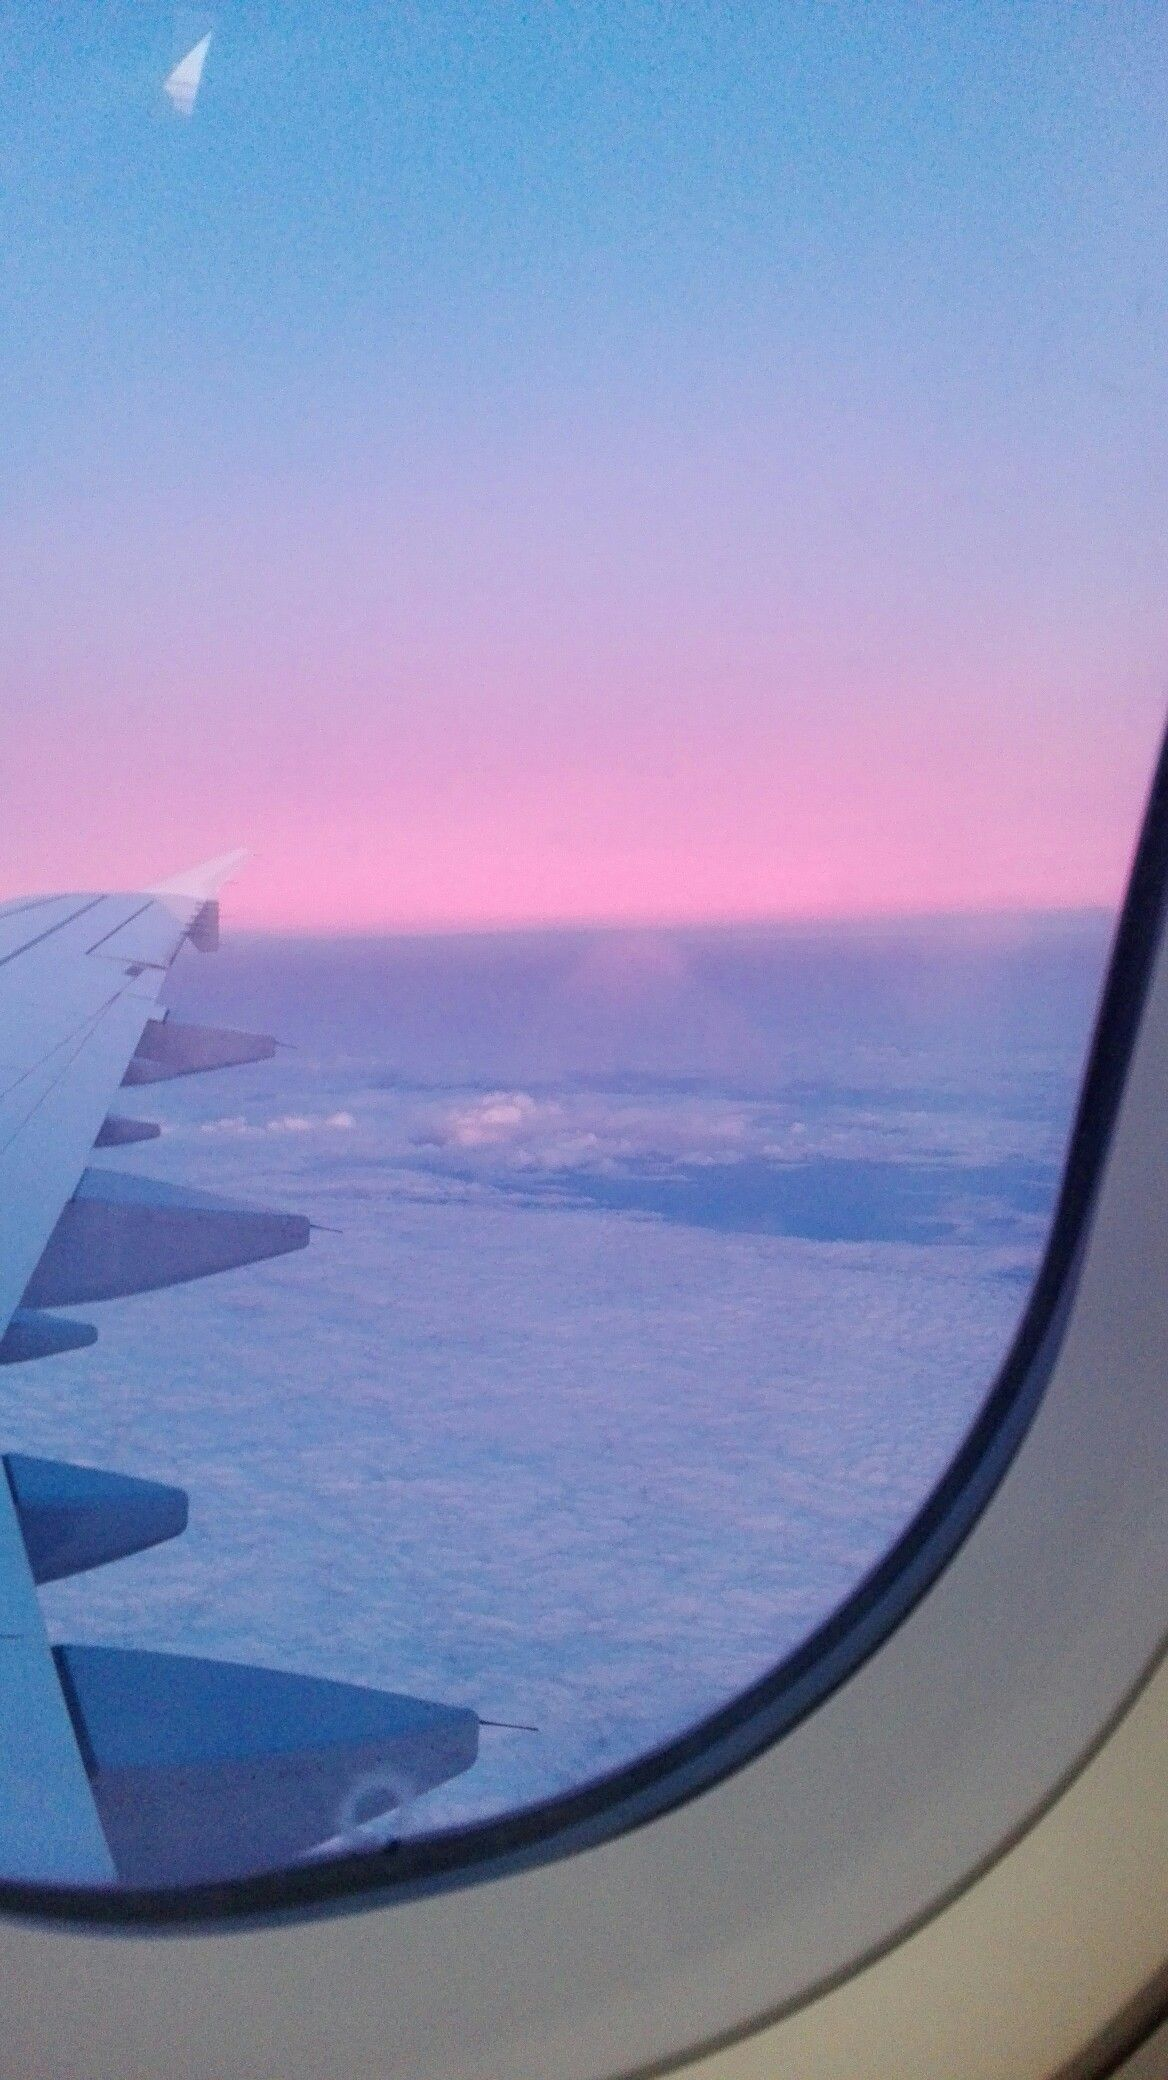 sunset airplane window aesthetic